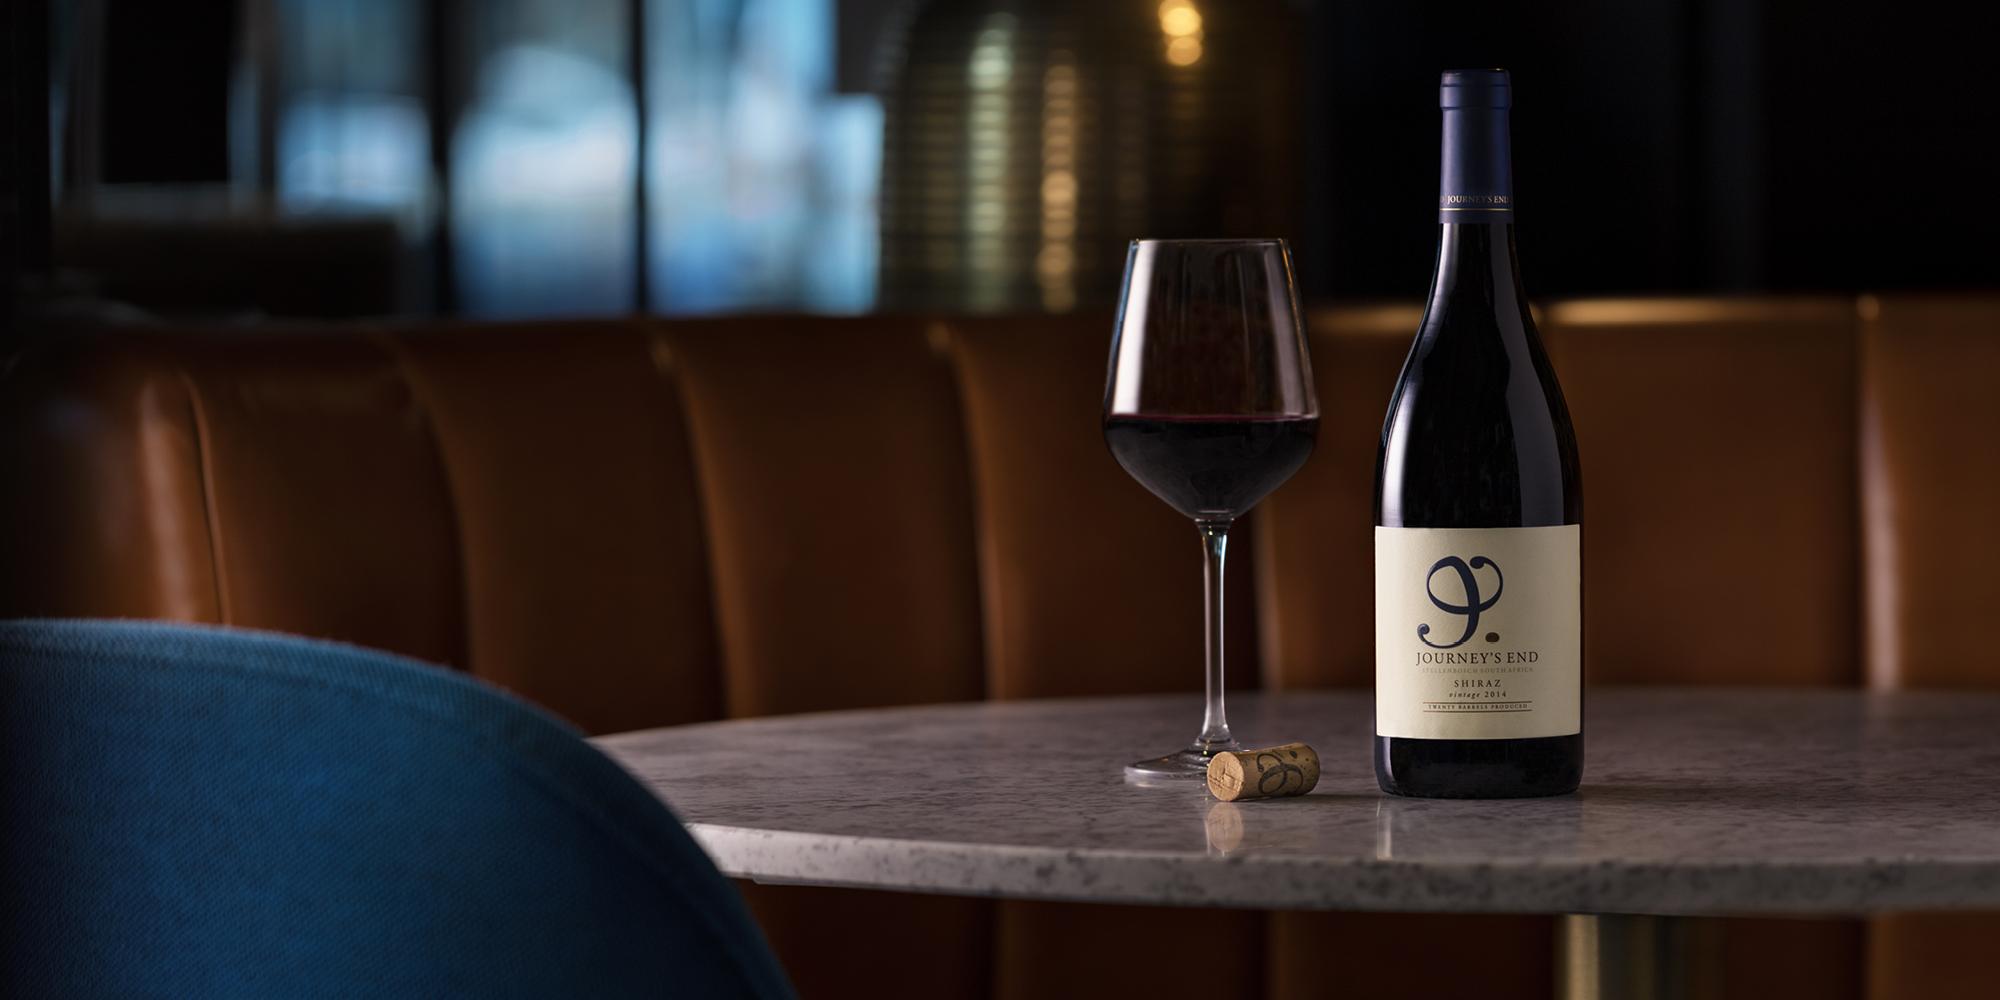 The Grahamston Bar I Journey's End Shiraz red wine